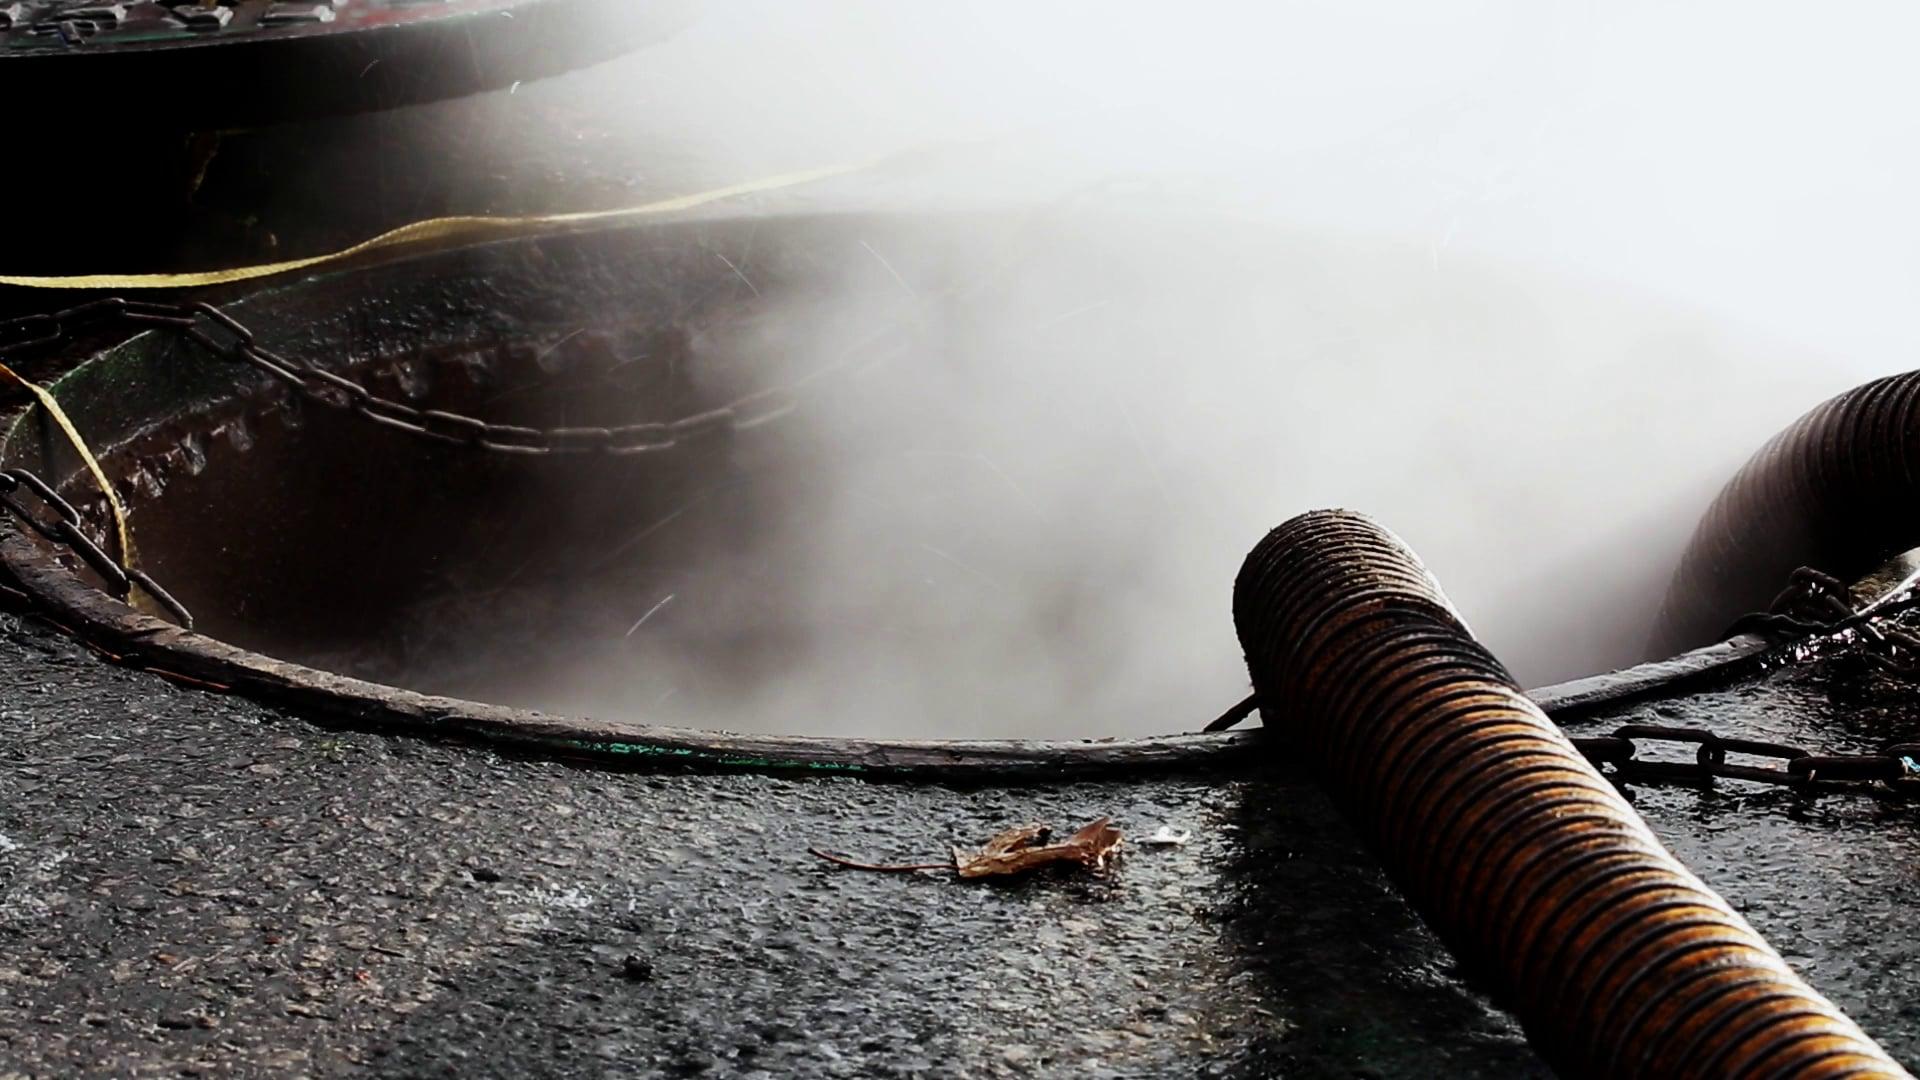 Dramatic Manhole